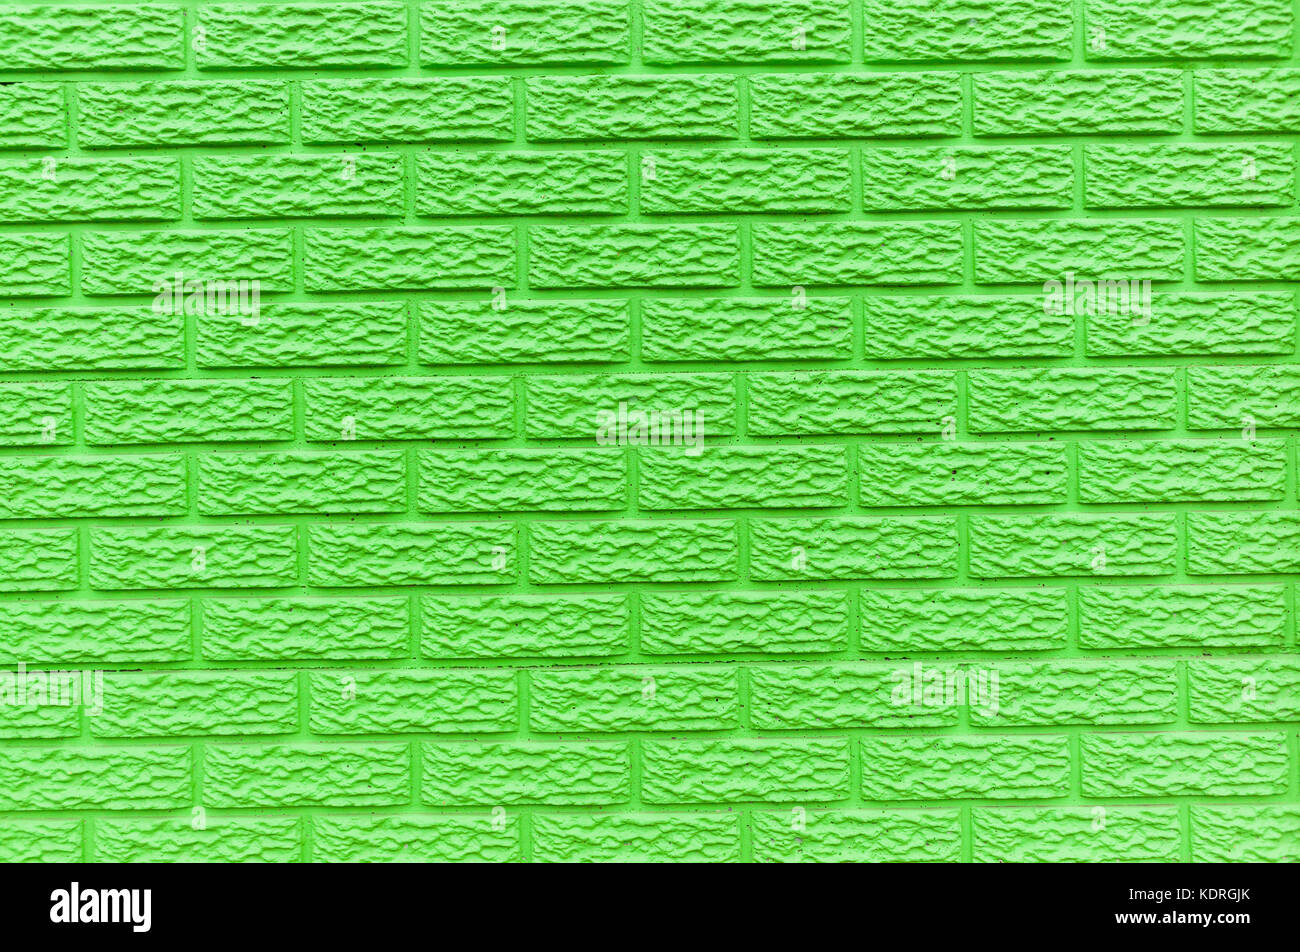 wall brick mold slats closeup pastel color lime green paint detail